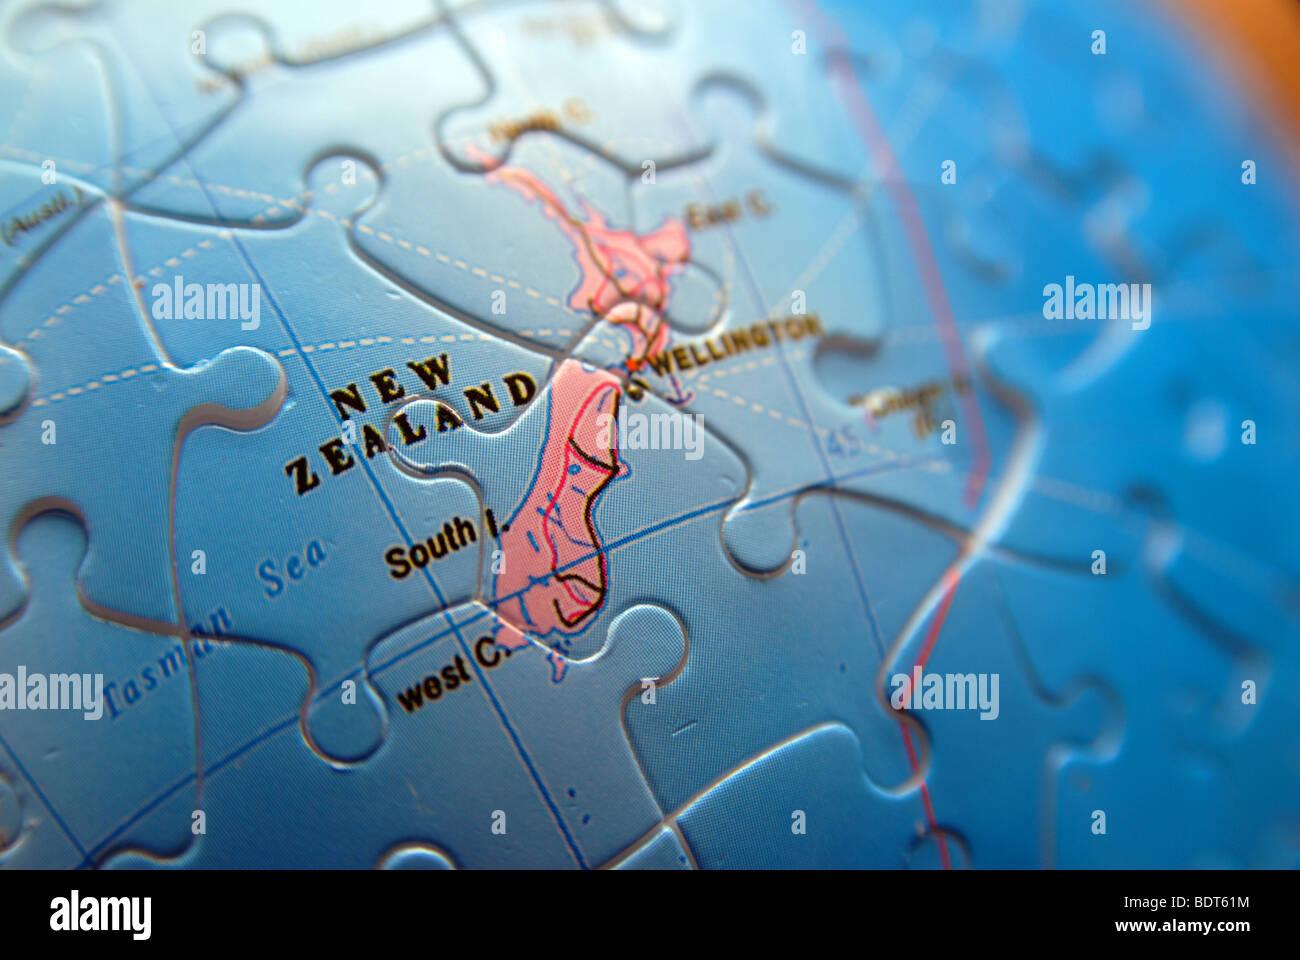 Detail of a globemap jigsaw detail new zealand stock photo detail of a globemap jigsaw detail new zealand gumiabroncs Image collections